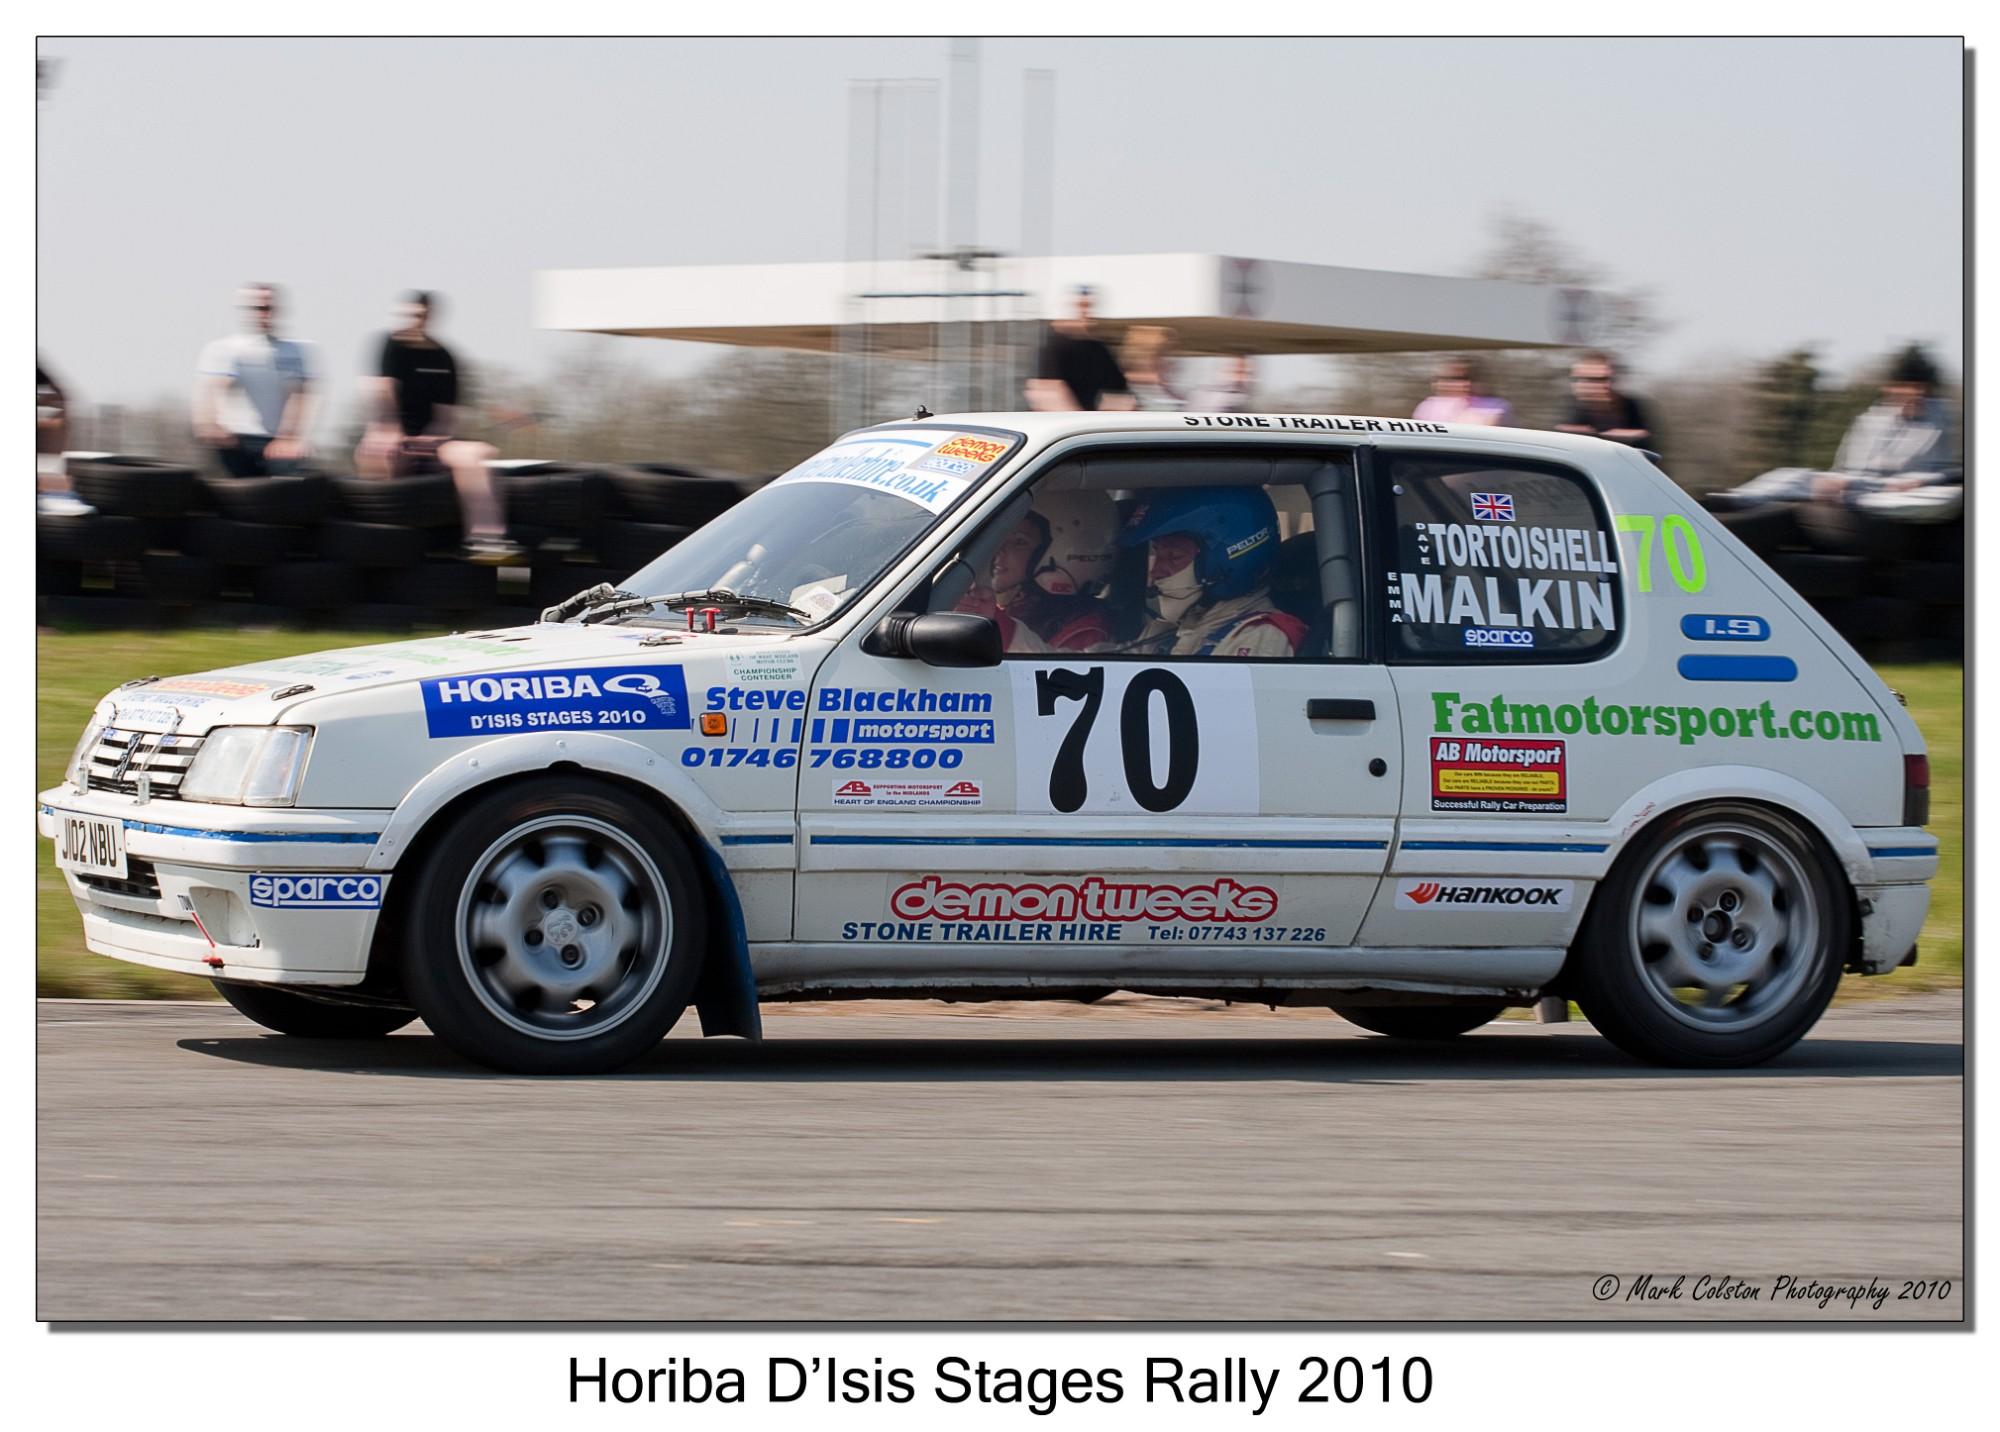 IMAGE: http://www.mark.colston-online.co.uk/Motorsport/D'Isis%202010/slides/IMG_2263%20EOS-1D%20Mark%20III%20copy.jpg